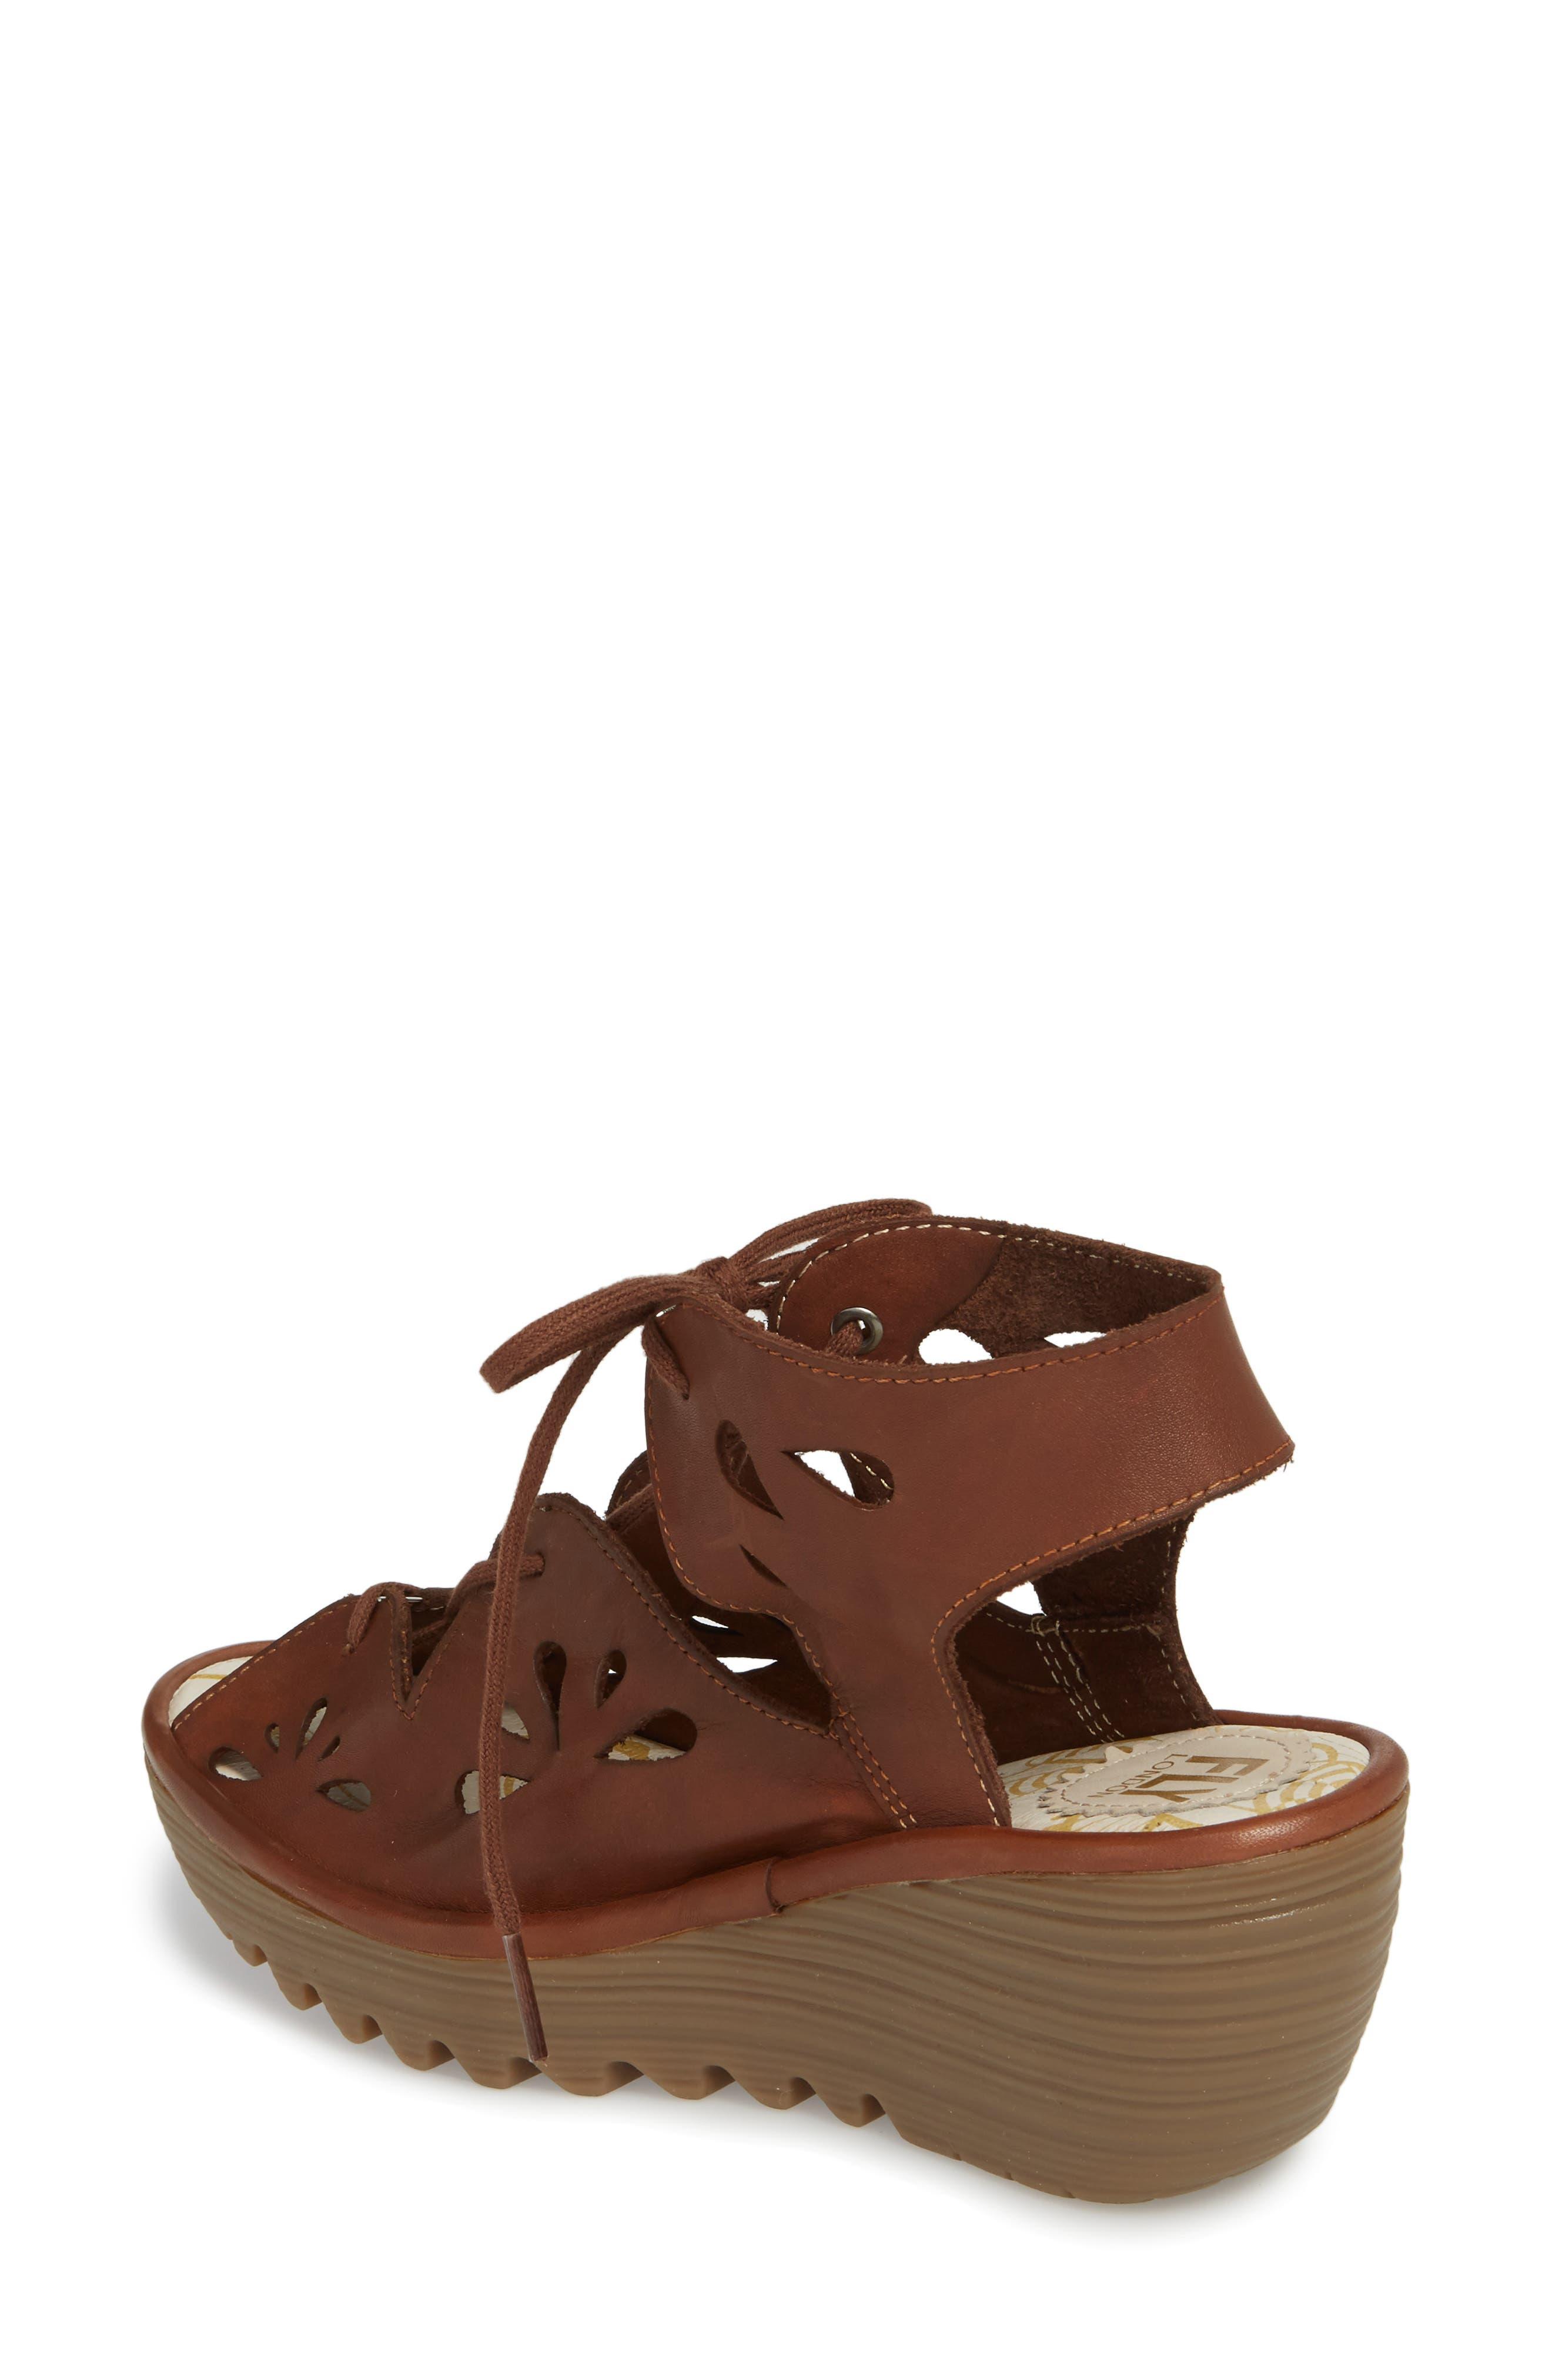 Yote Sandal,                             Alternate thumbnail 2, color,                             Brown Colmar Leather